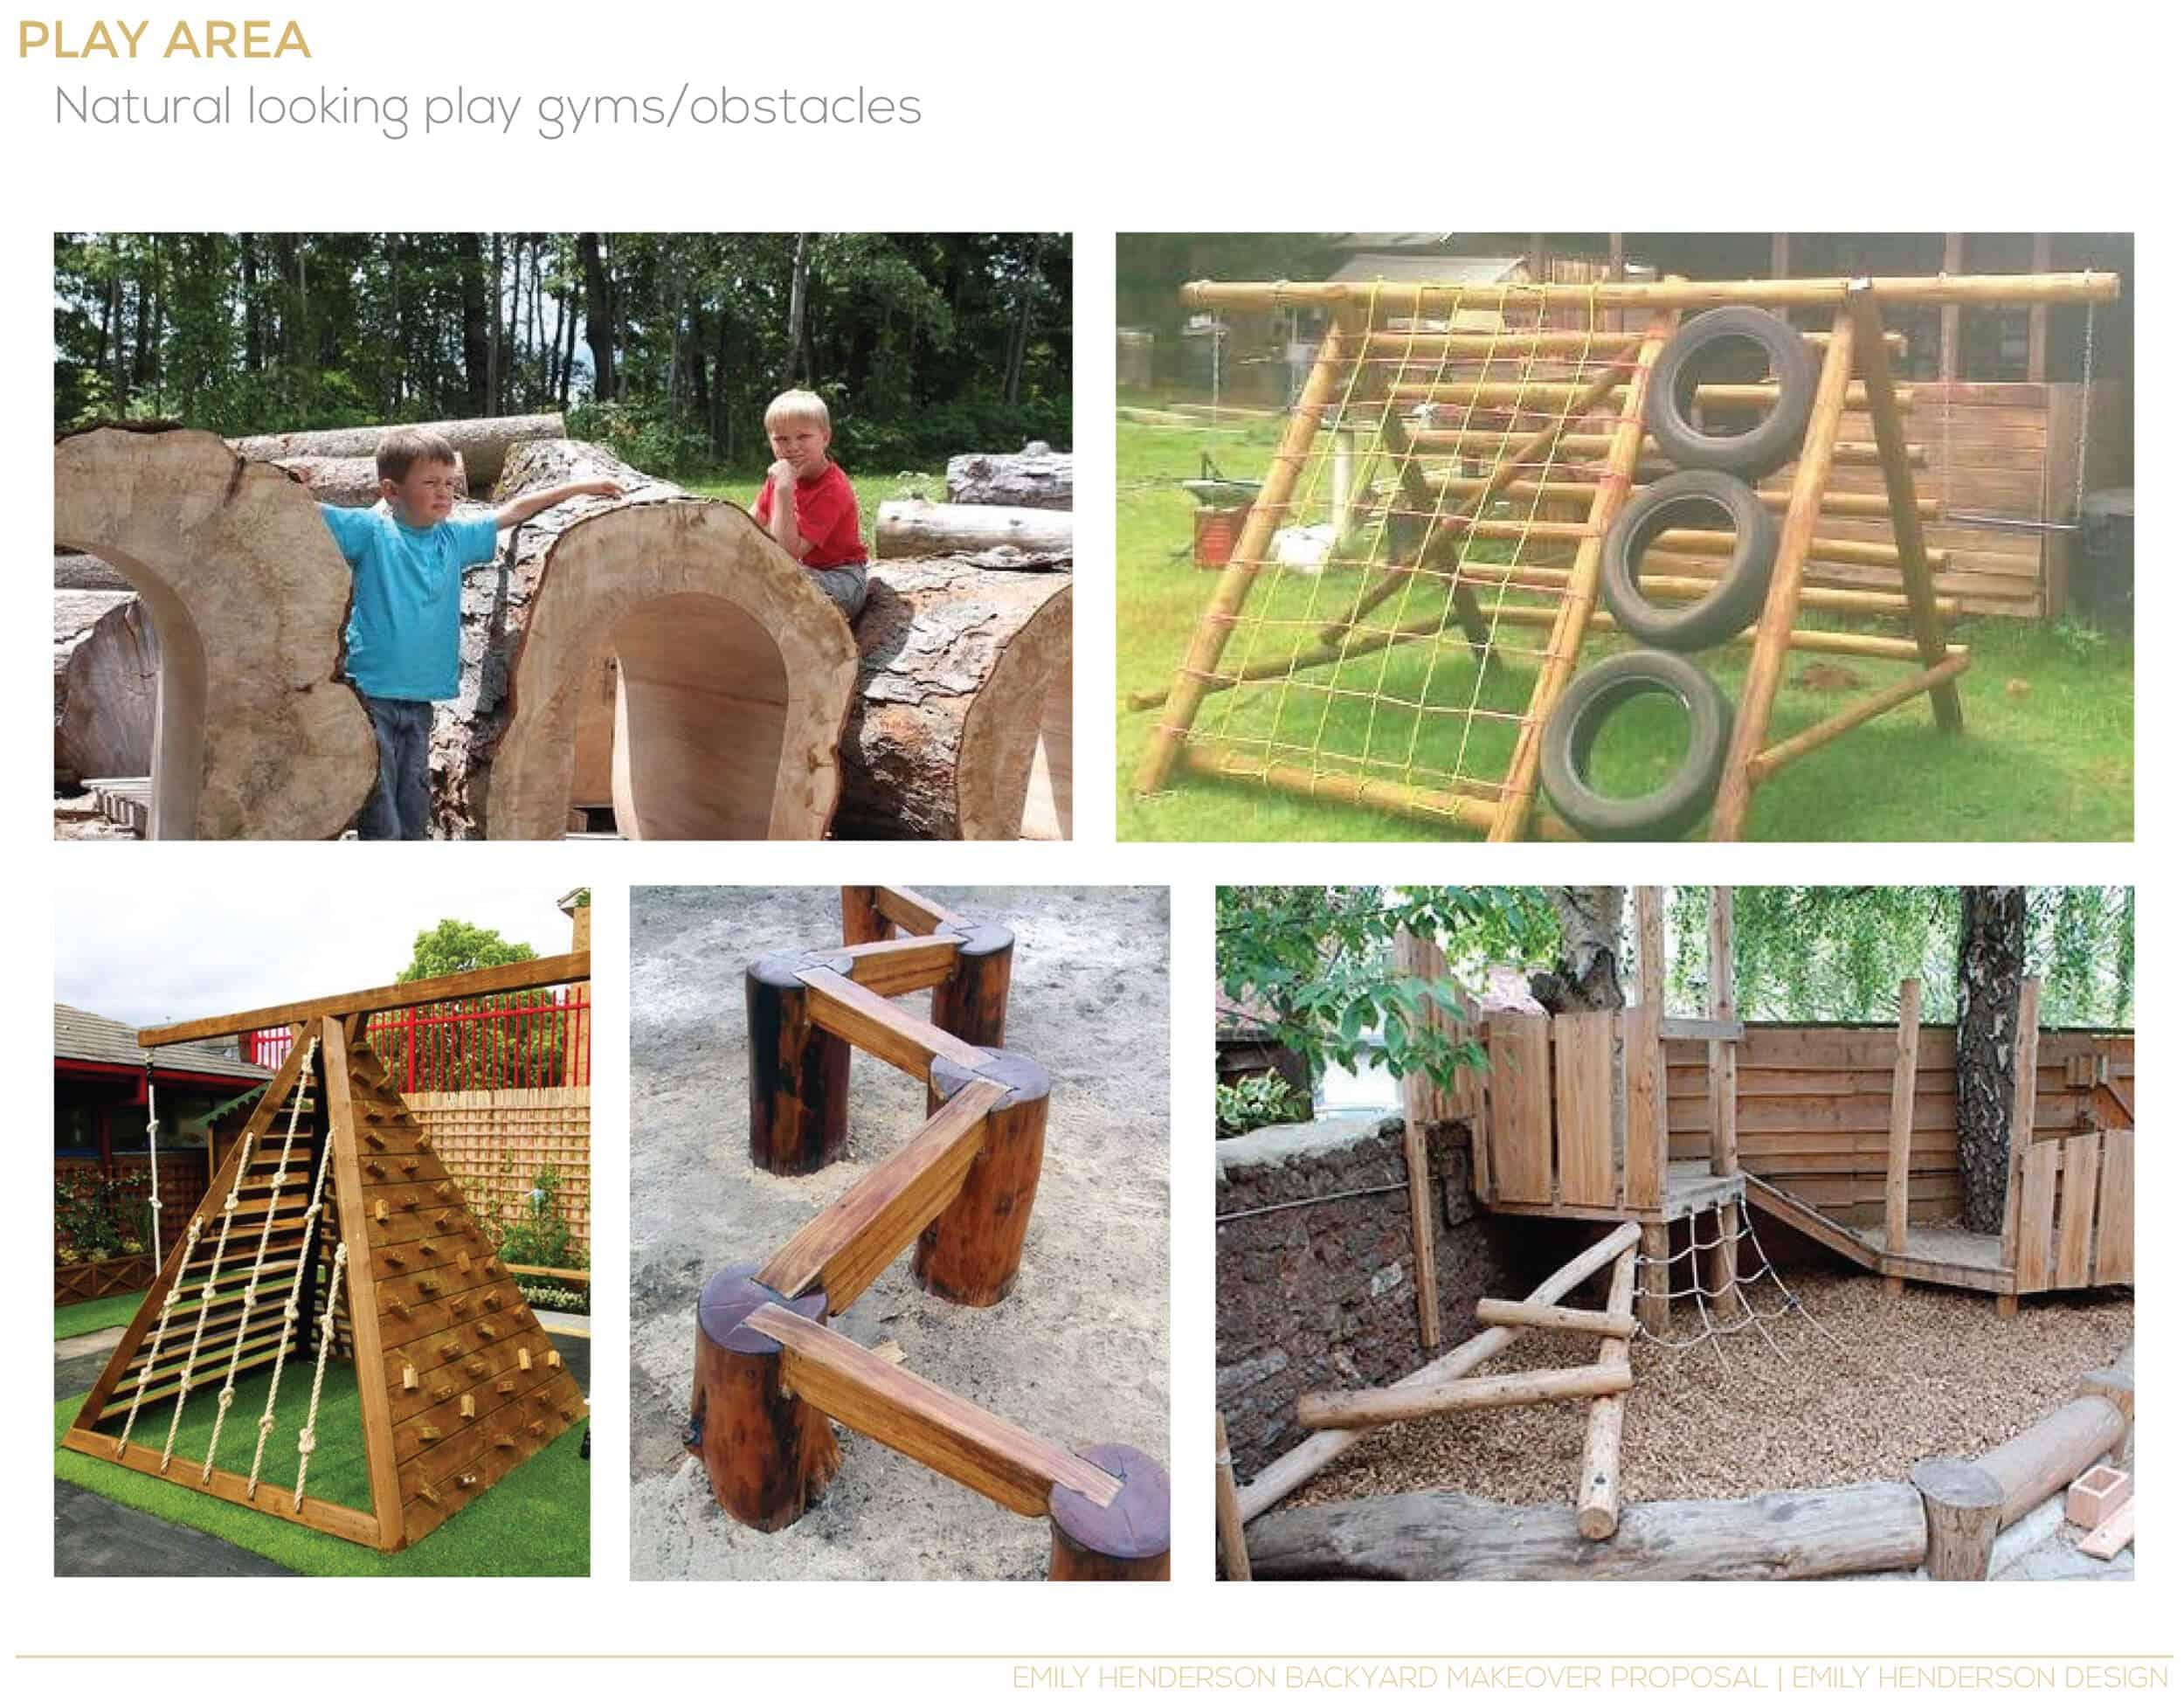 emily-henderson_waverly_backyard-makeover-proposal_2016-9